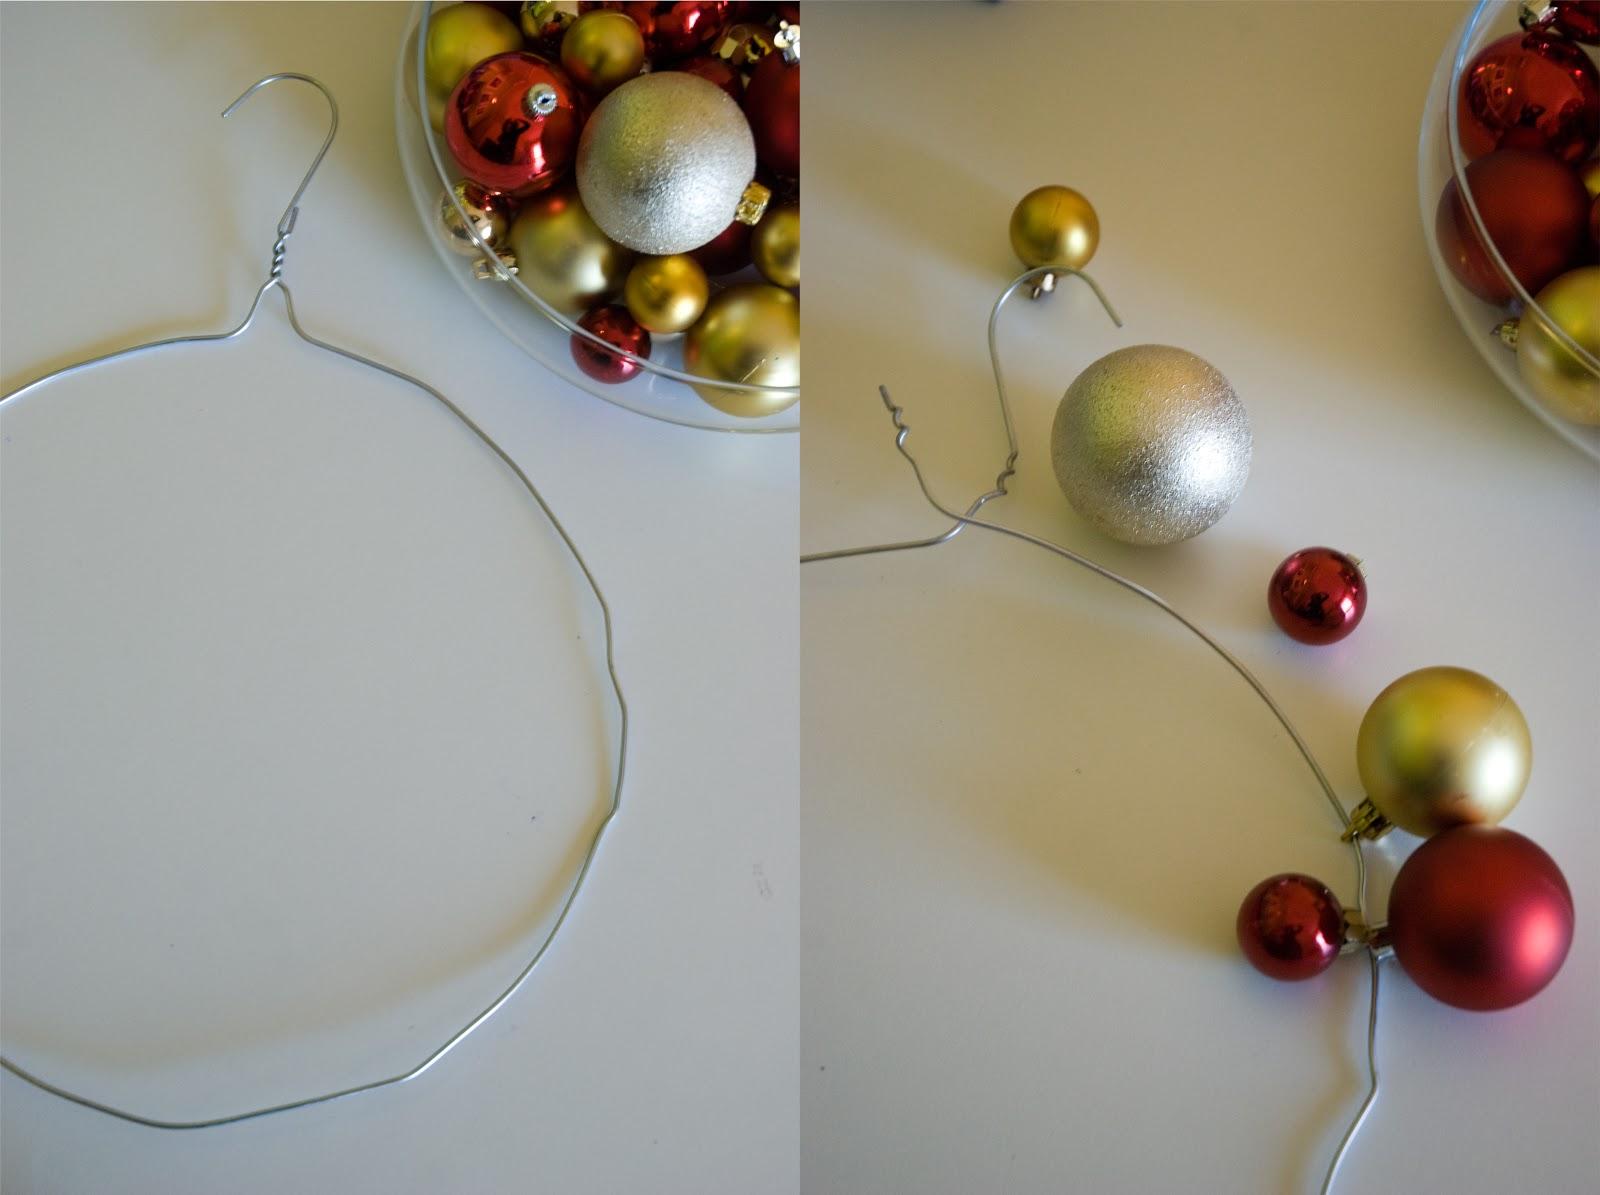 Facile idea ghirlanda natalizia fai da te economica